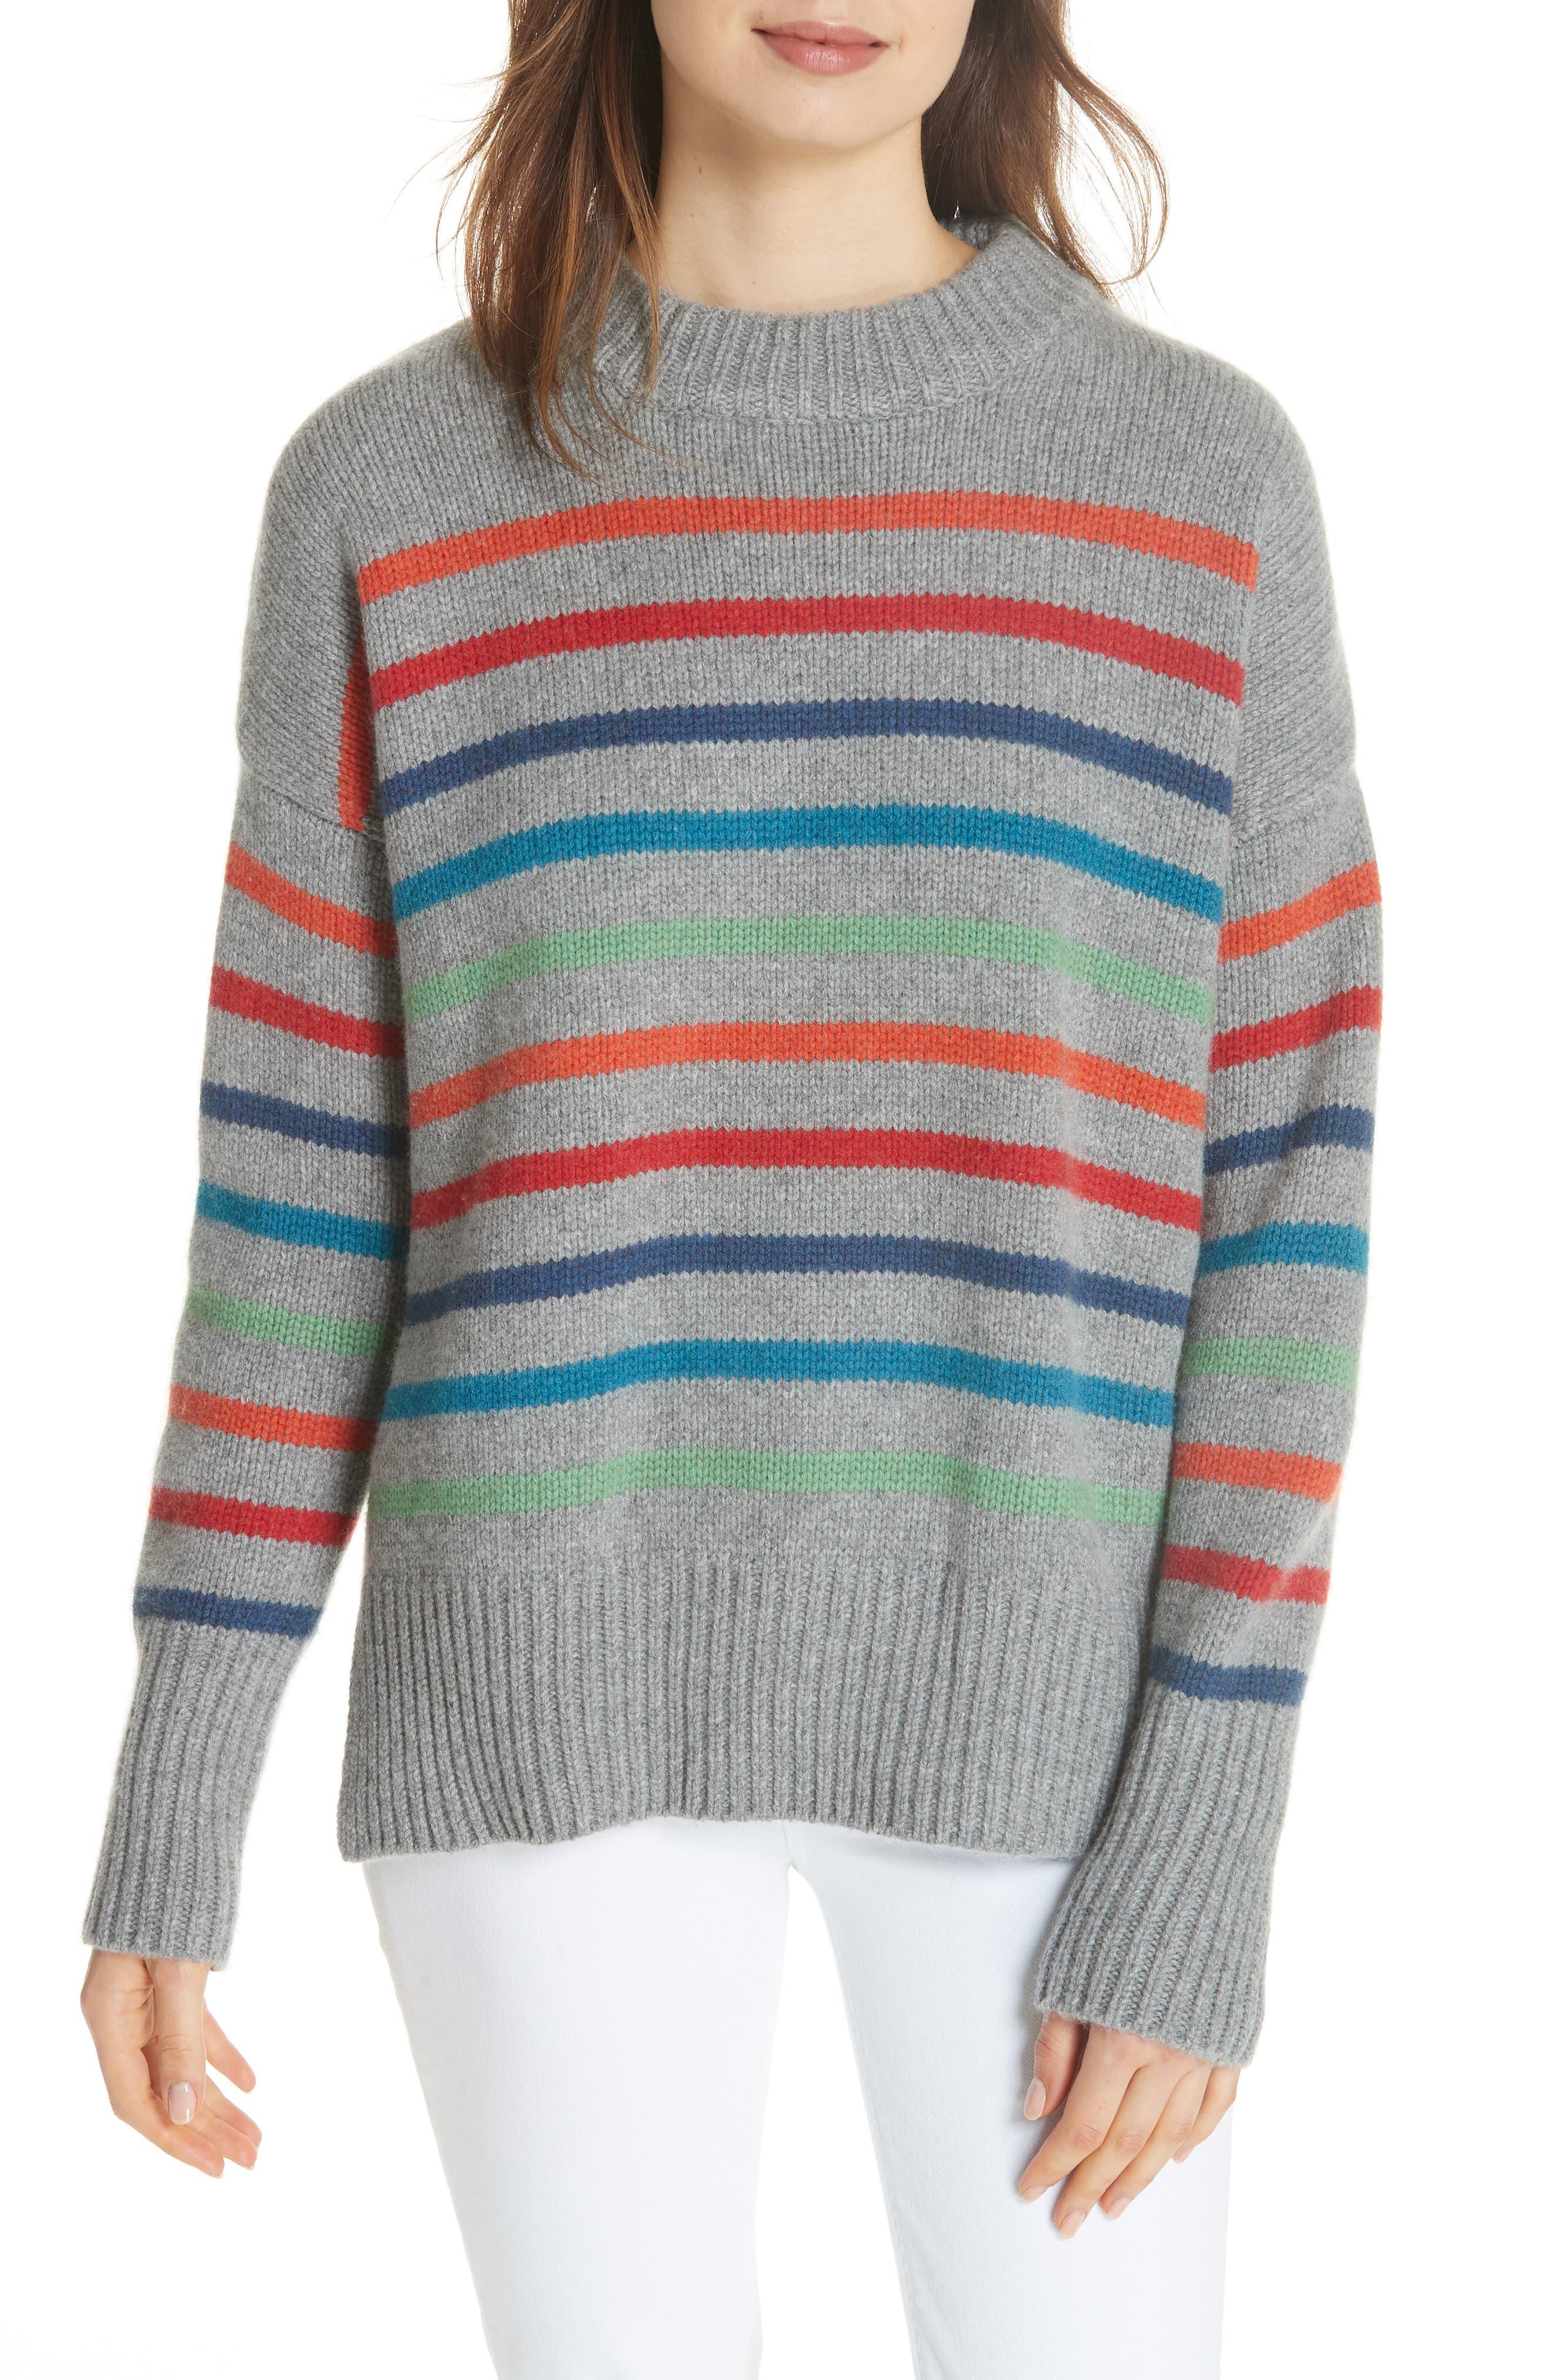 LA LIGNE Marin Wool & Cashmere Sweater in Rainbow Stripe